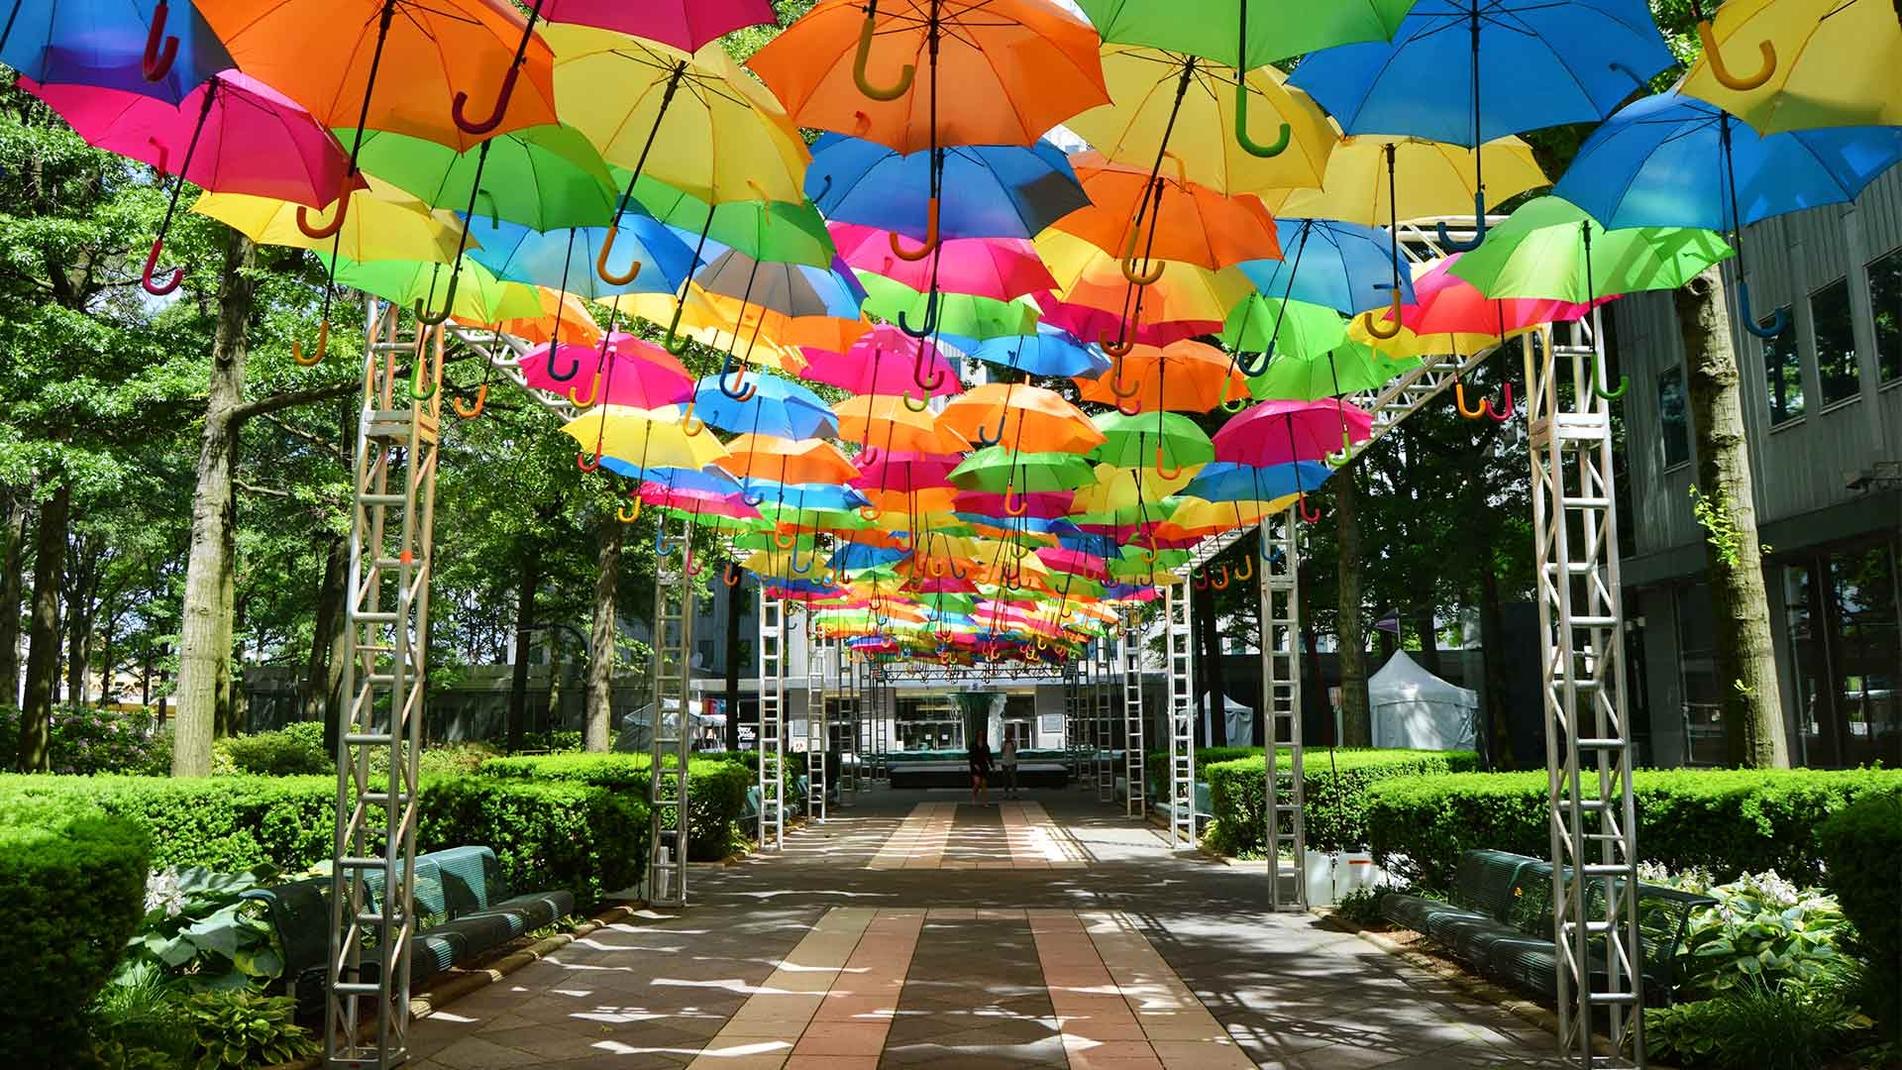 Umbrella Sky Project - Pittsburgh'17